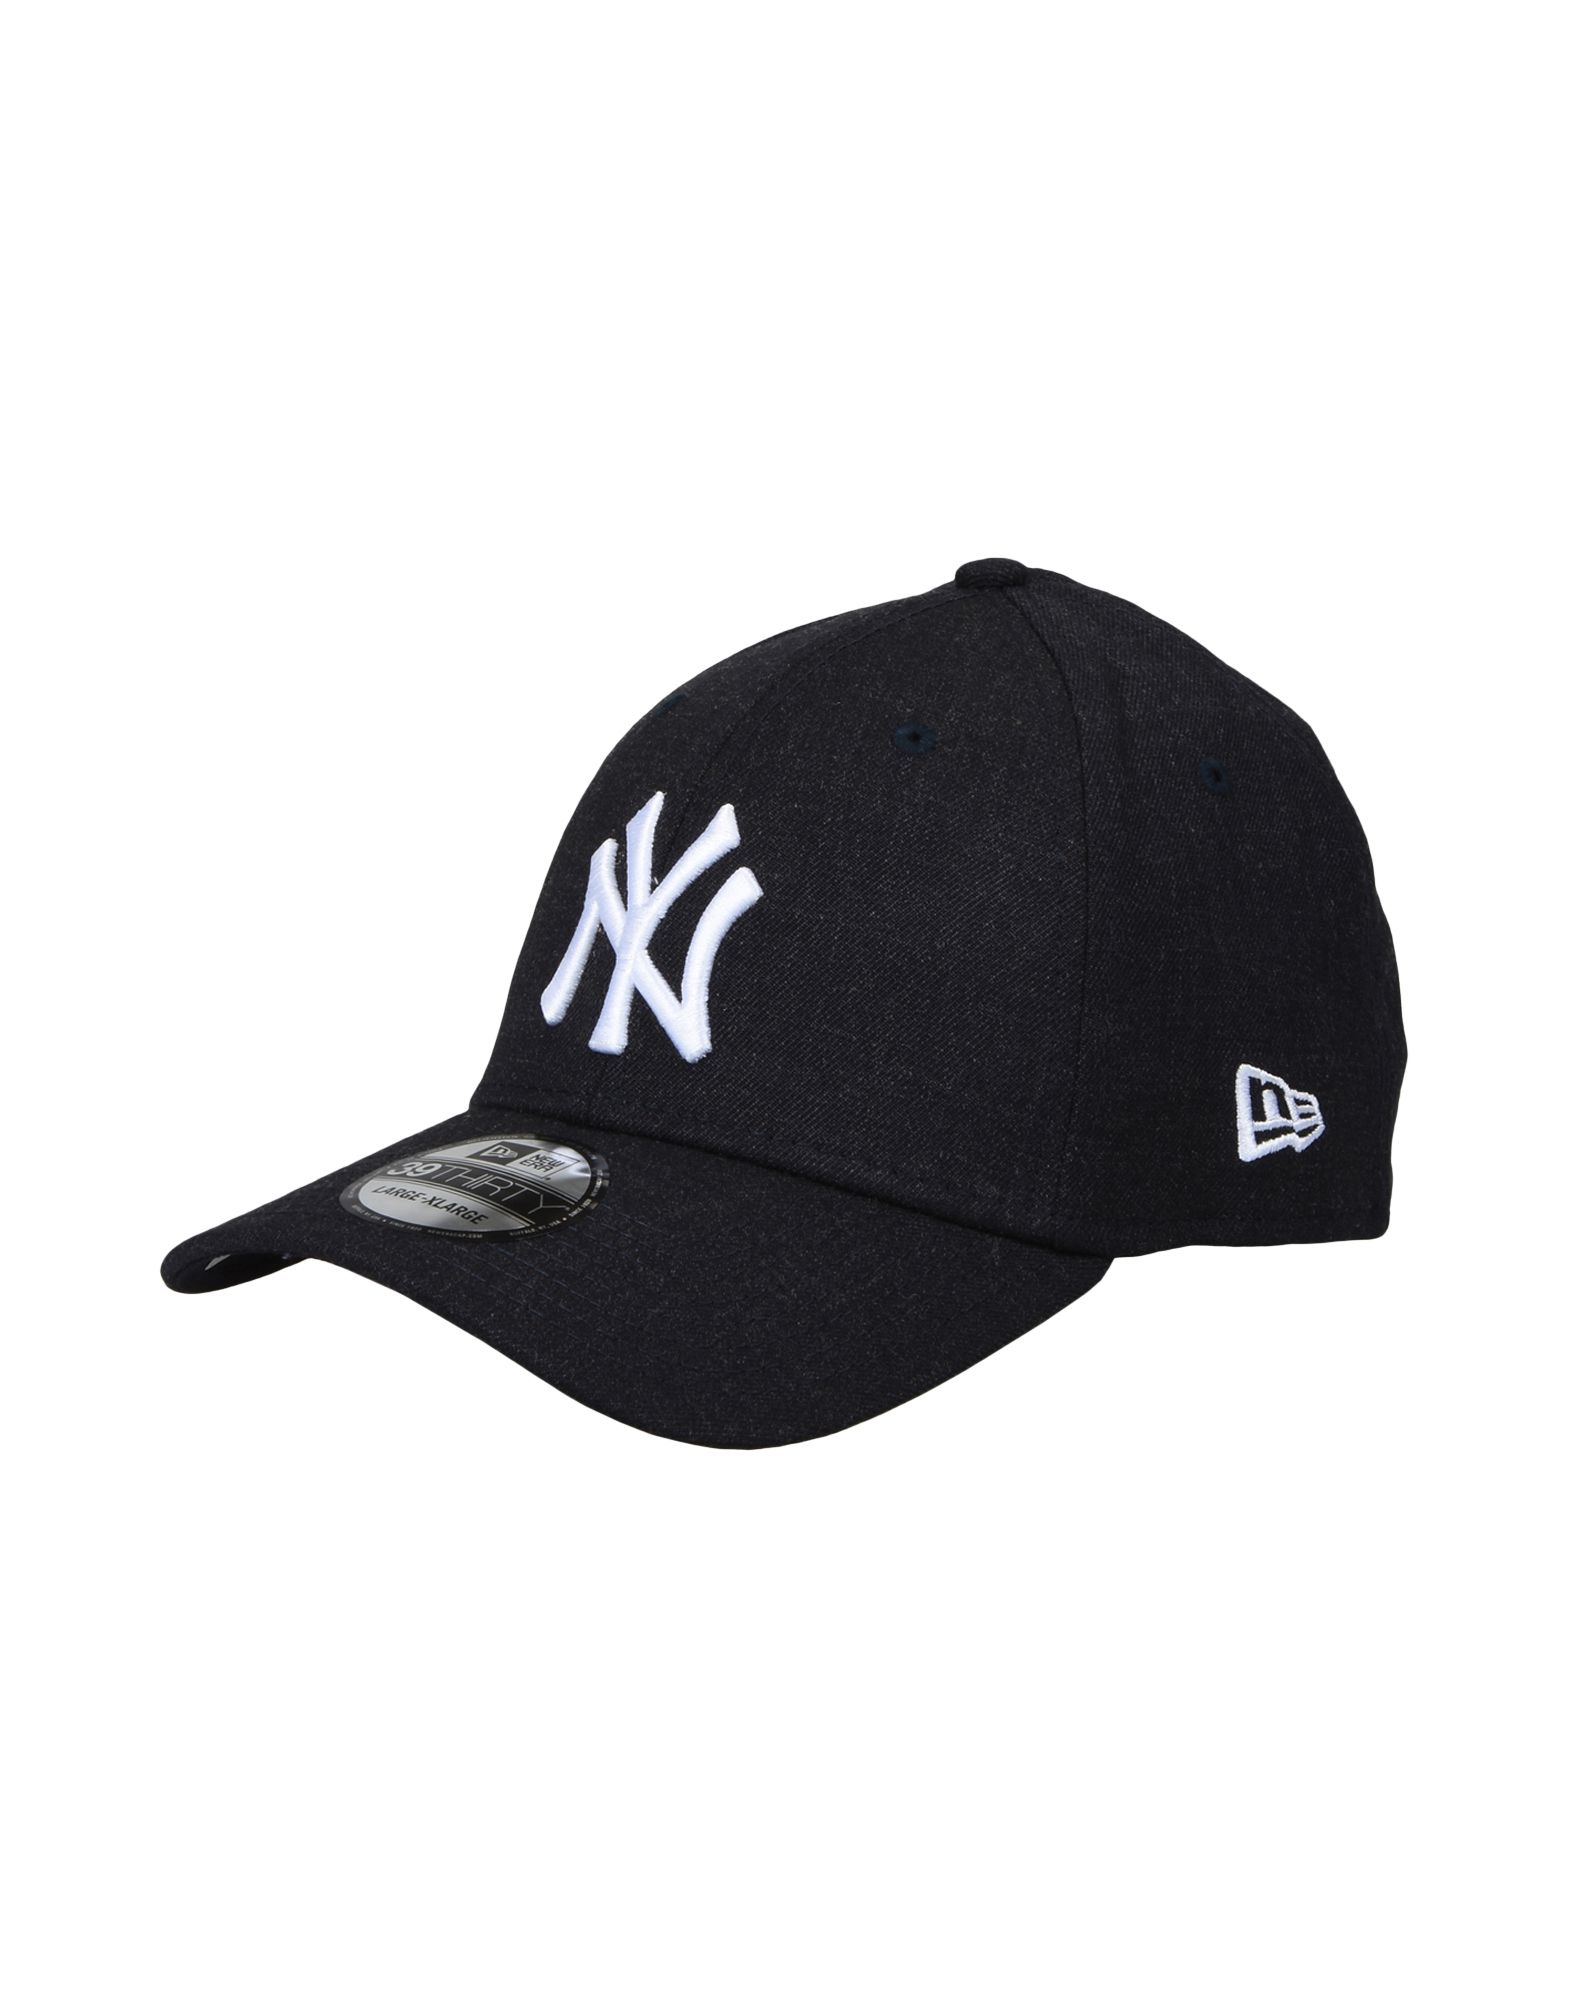 HEATHER TEAM 39THIRTY NEW YORK YANKEES - ACCESSORIES - Hats New Era vAkotFn